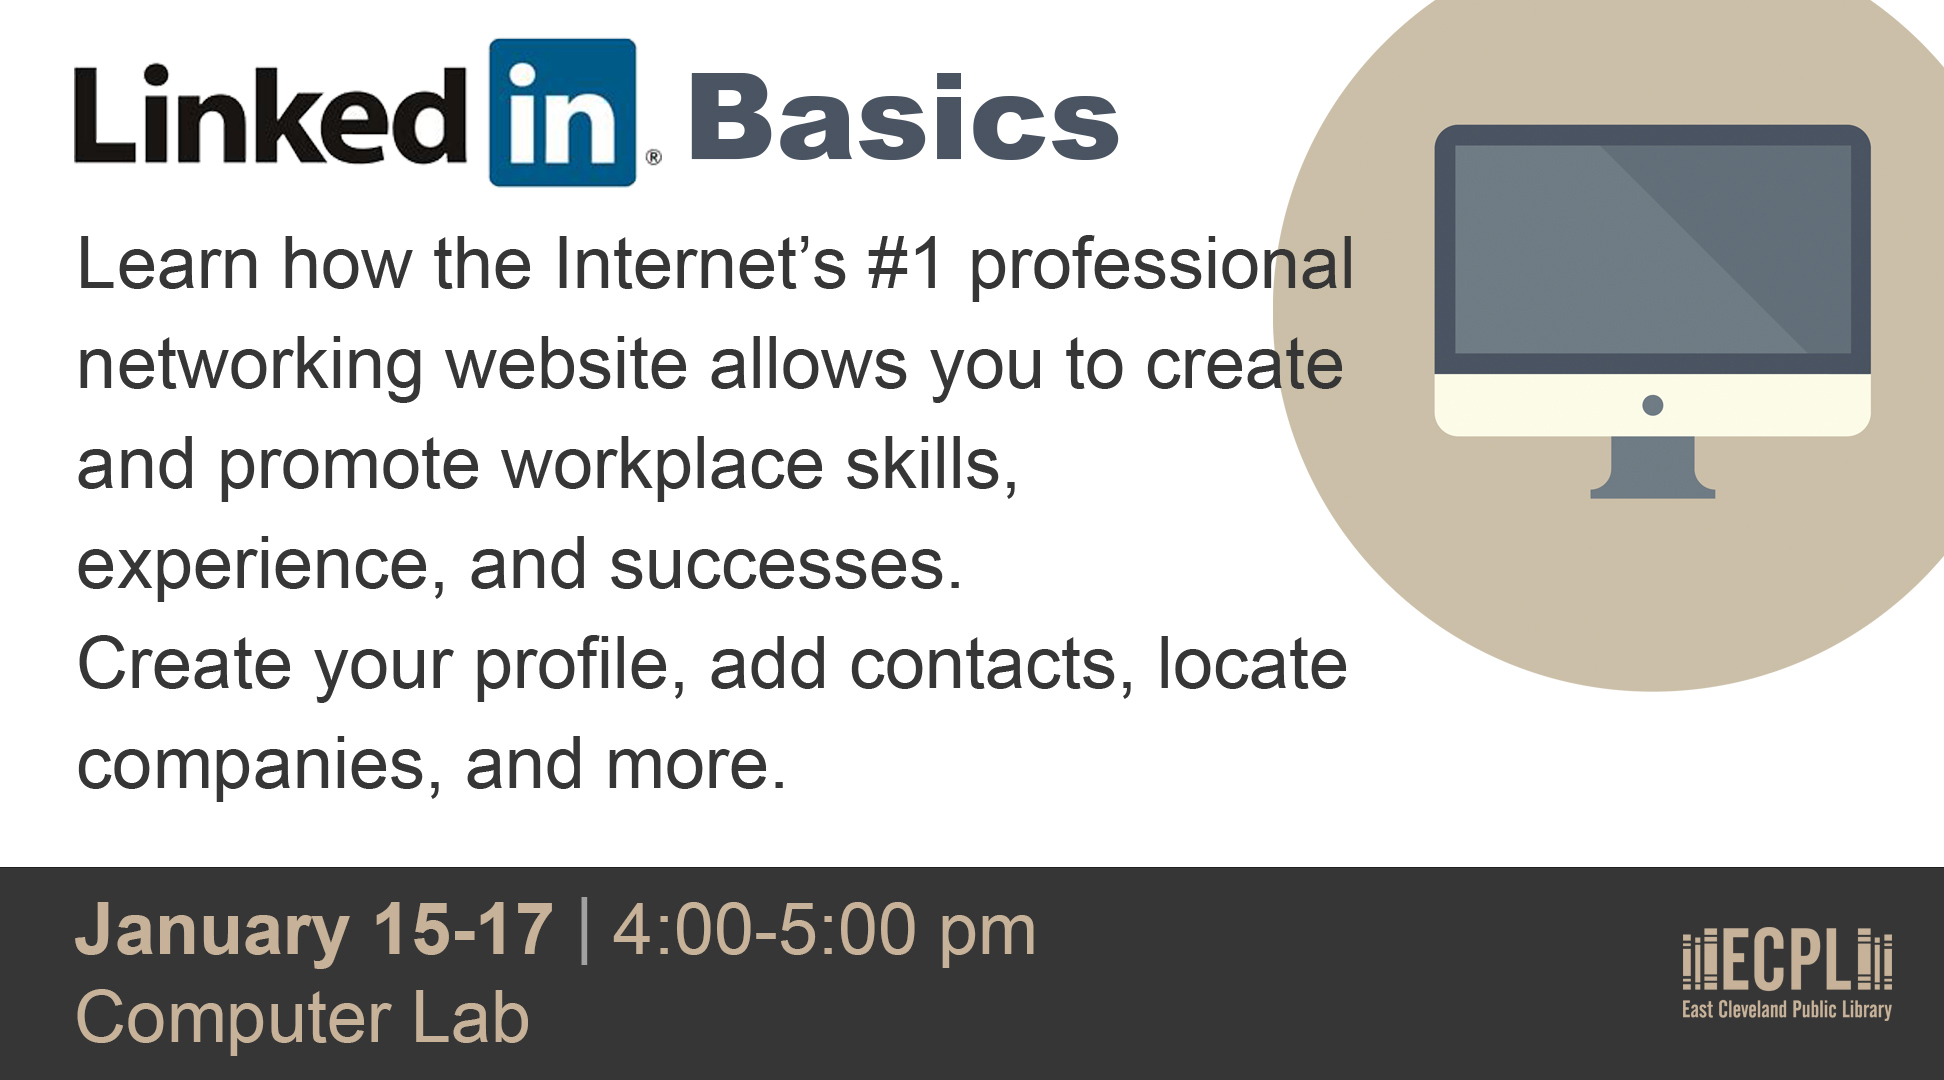 LinkedIn Basics